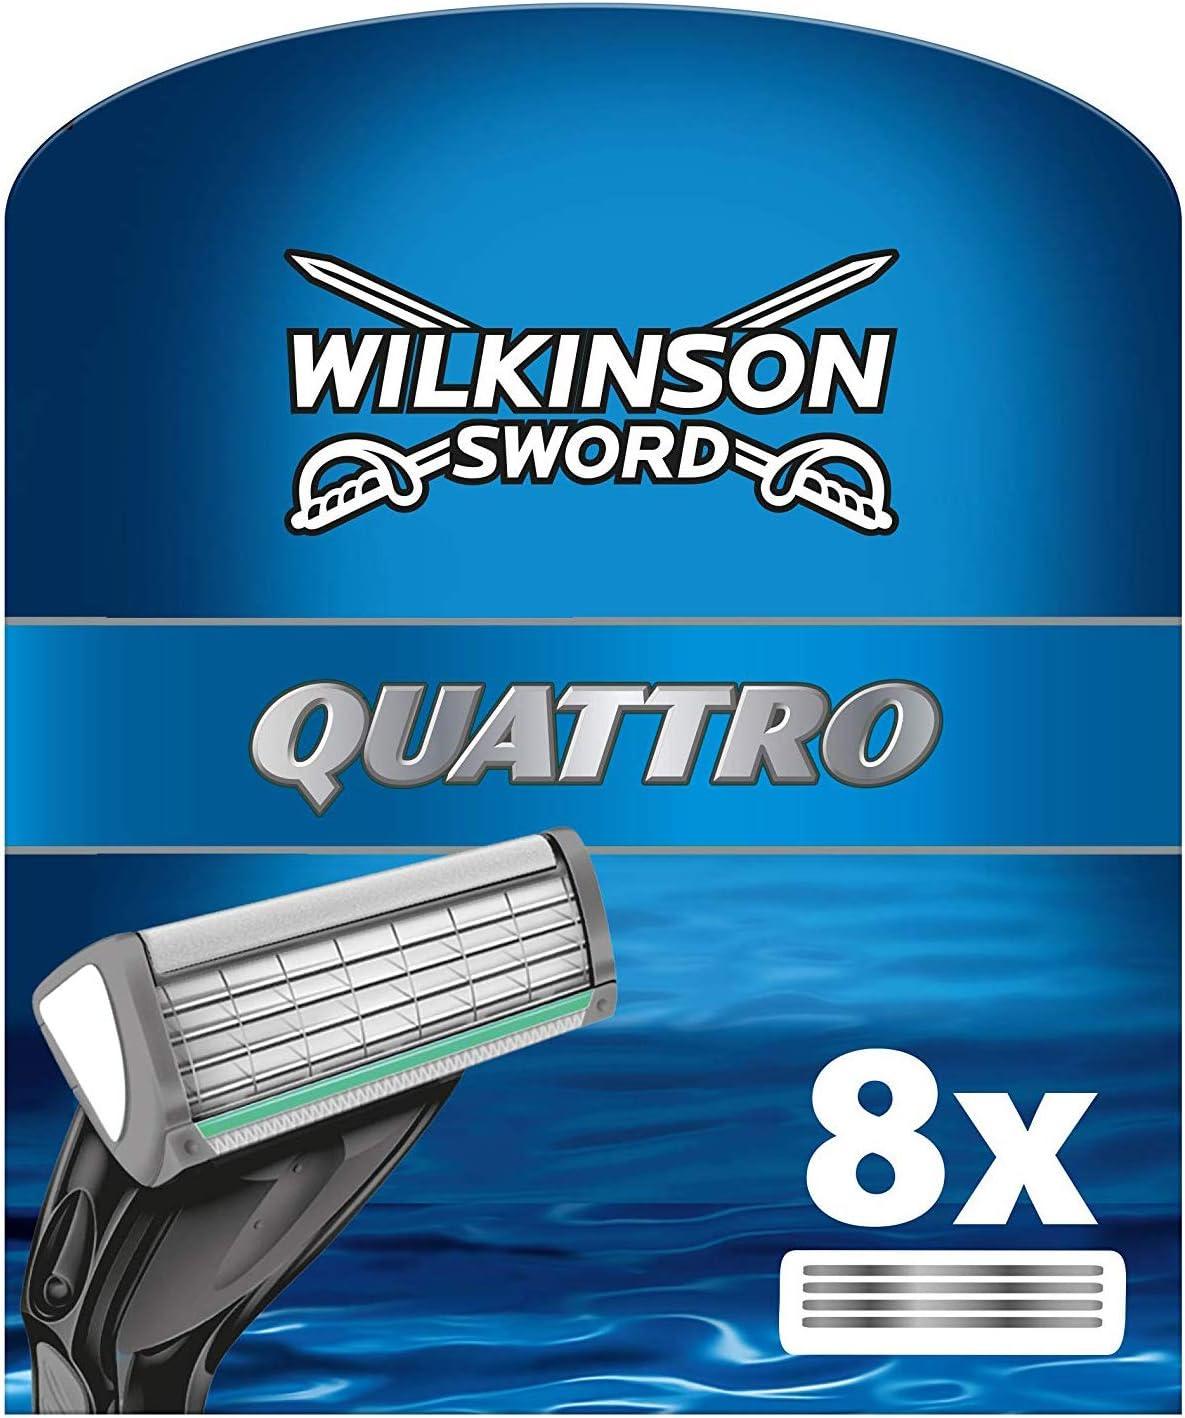 Wilkinson Sword Quattro Plus - Cargador de 8 Unidades de Recambio de Cuchillas de Afeitar para Hombre de 4 Hojas, Afeitado Manual Masculino